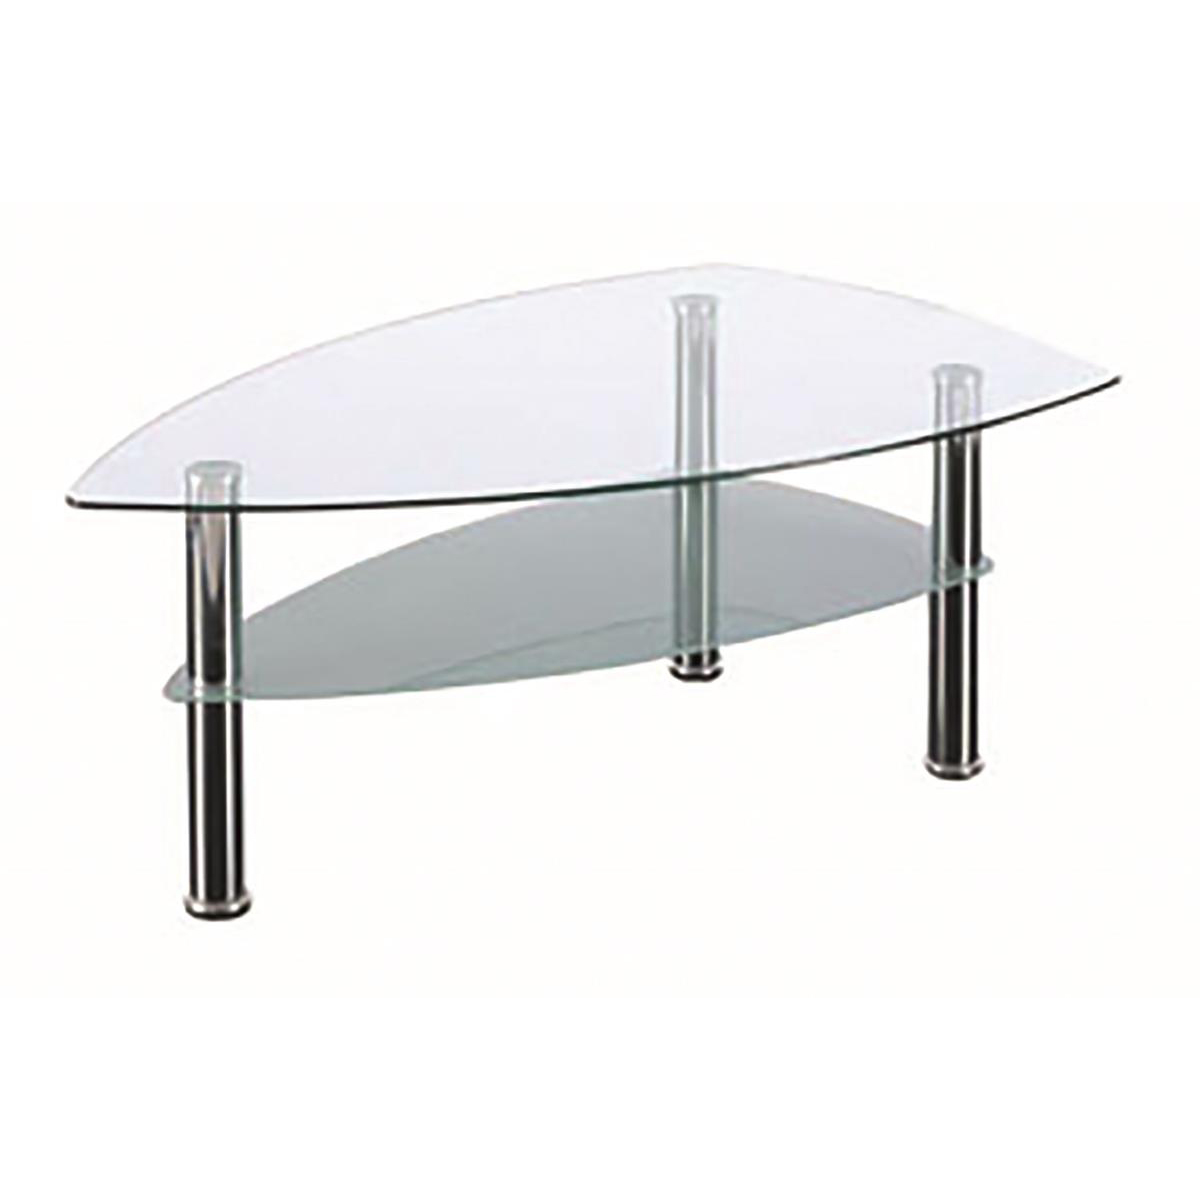 Sonix Boat Glass Table 1190x690x450mm Chrome Legs